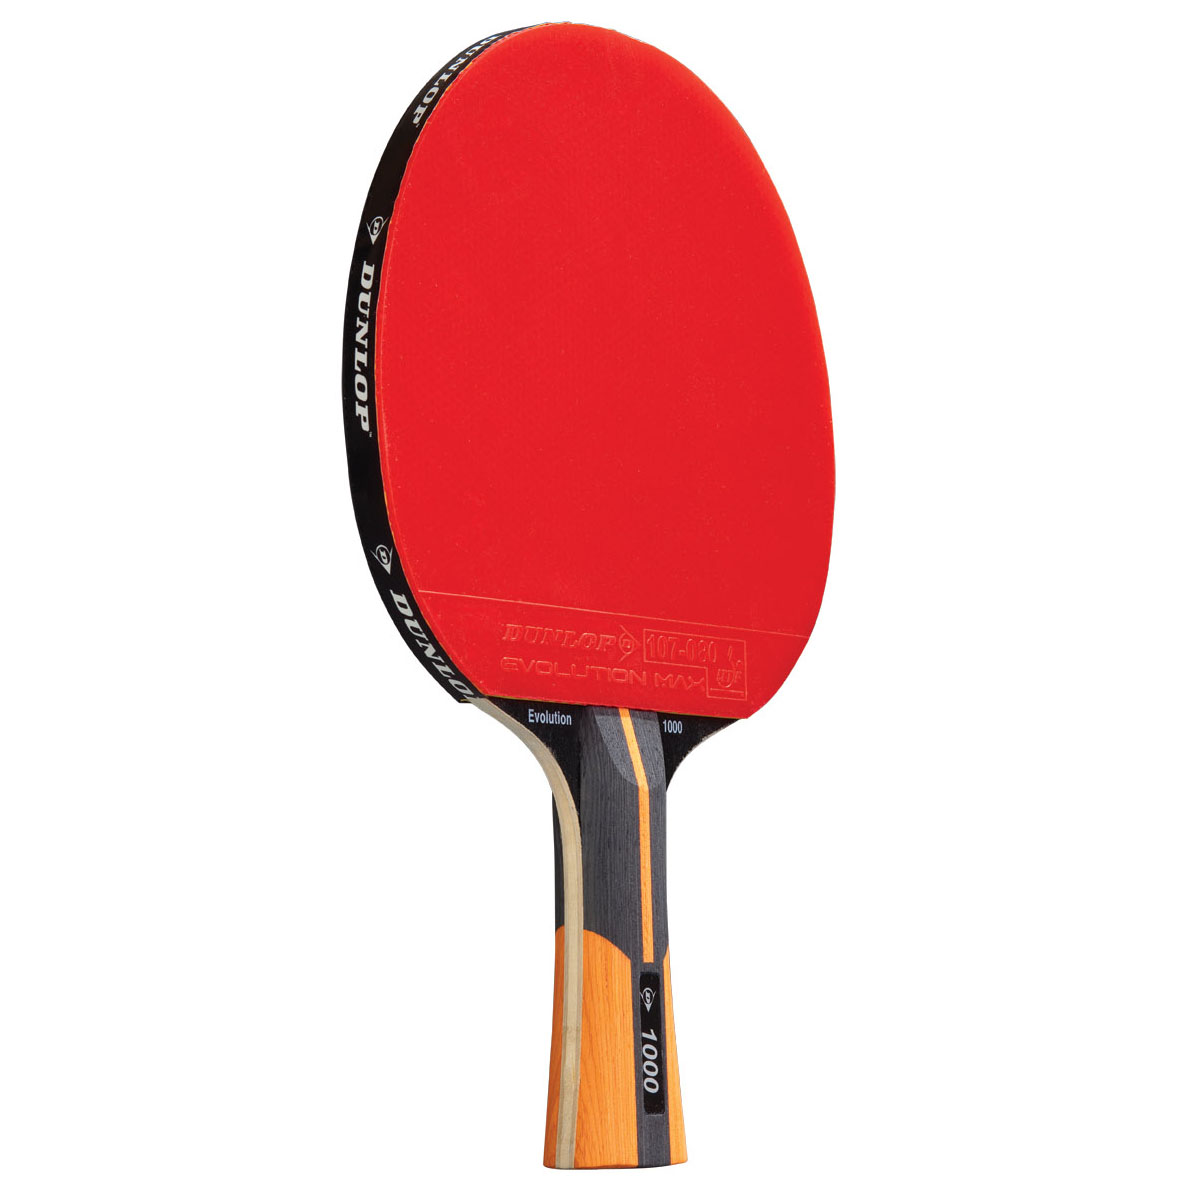 Dunlop Evolution 1000 Table Tennis Bat